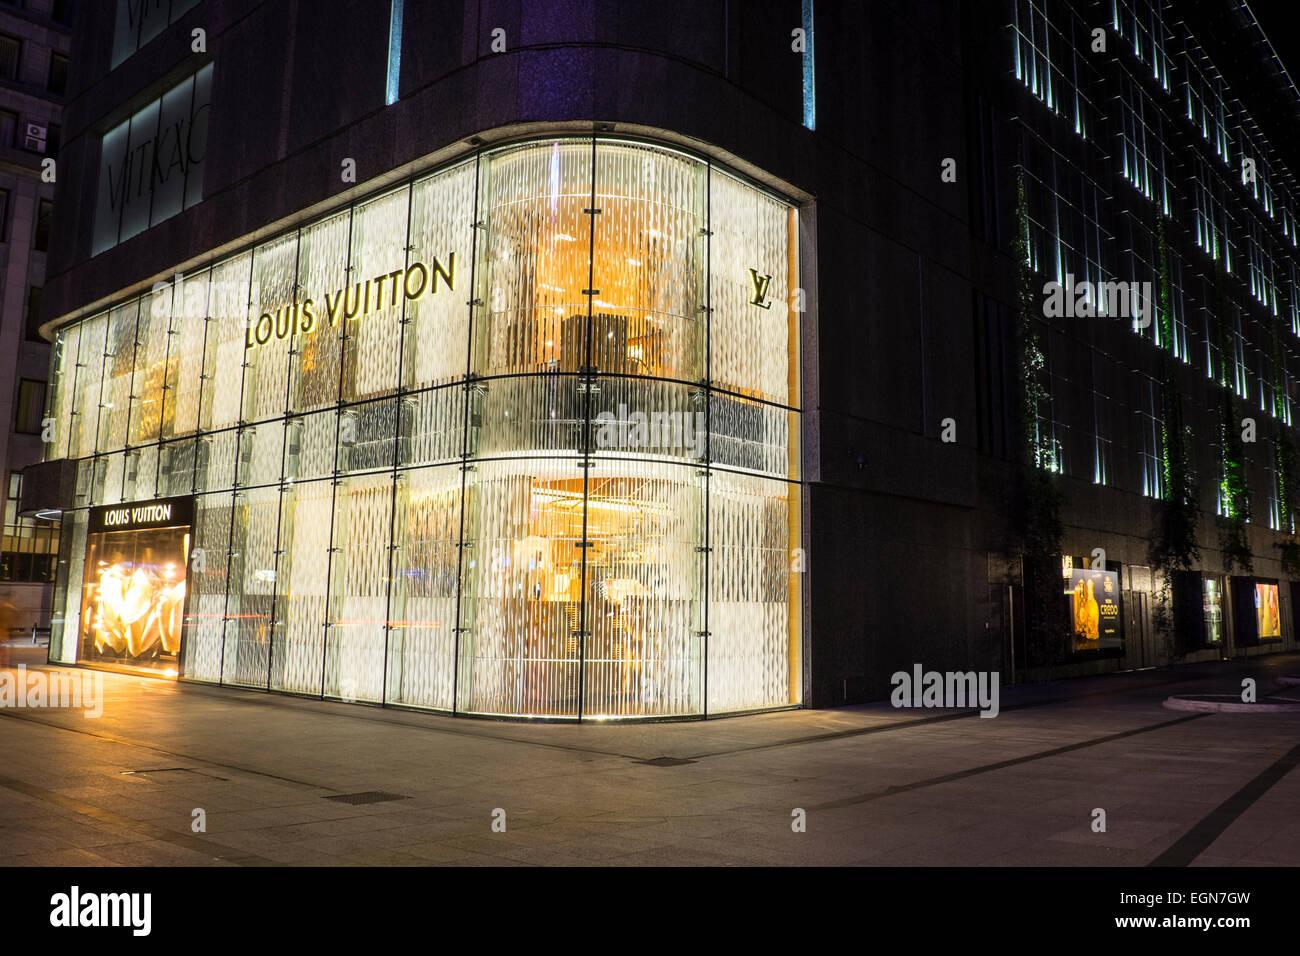 d20b3f231c263 Louis Vuitton store in Warsaw, Poland Stock Photo: 79142921 - Alamy